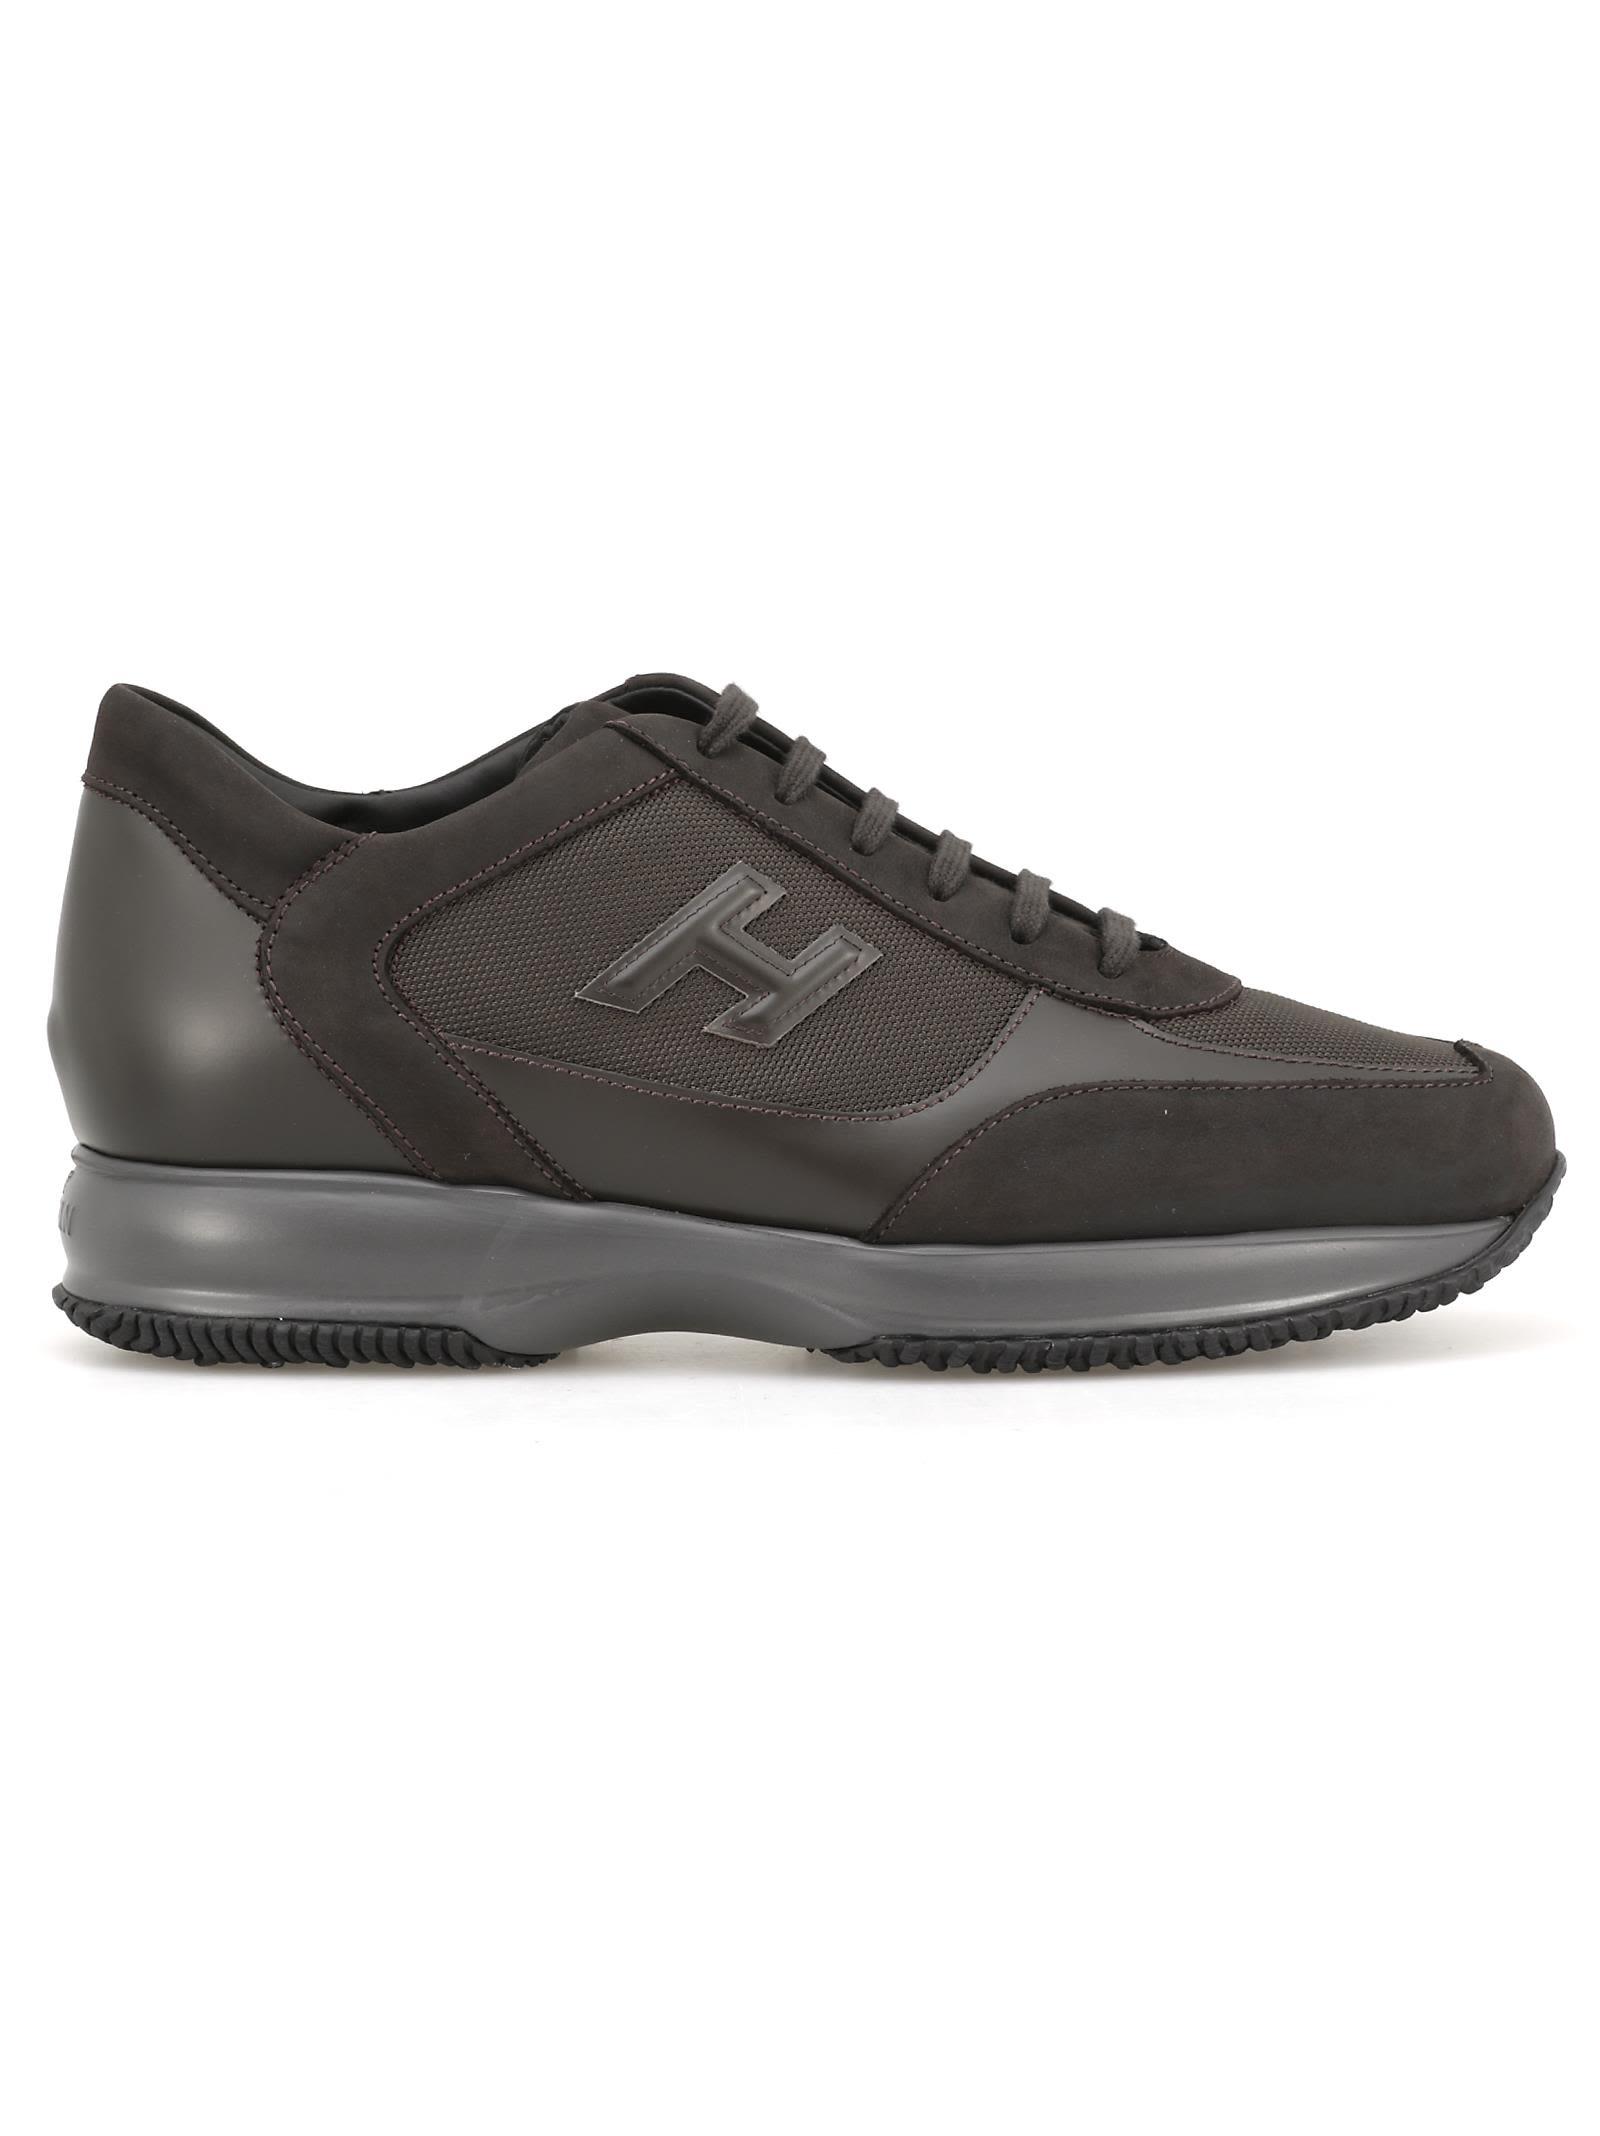 Hogan New Interactive Shoe